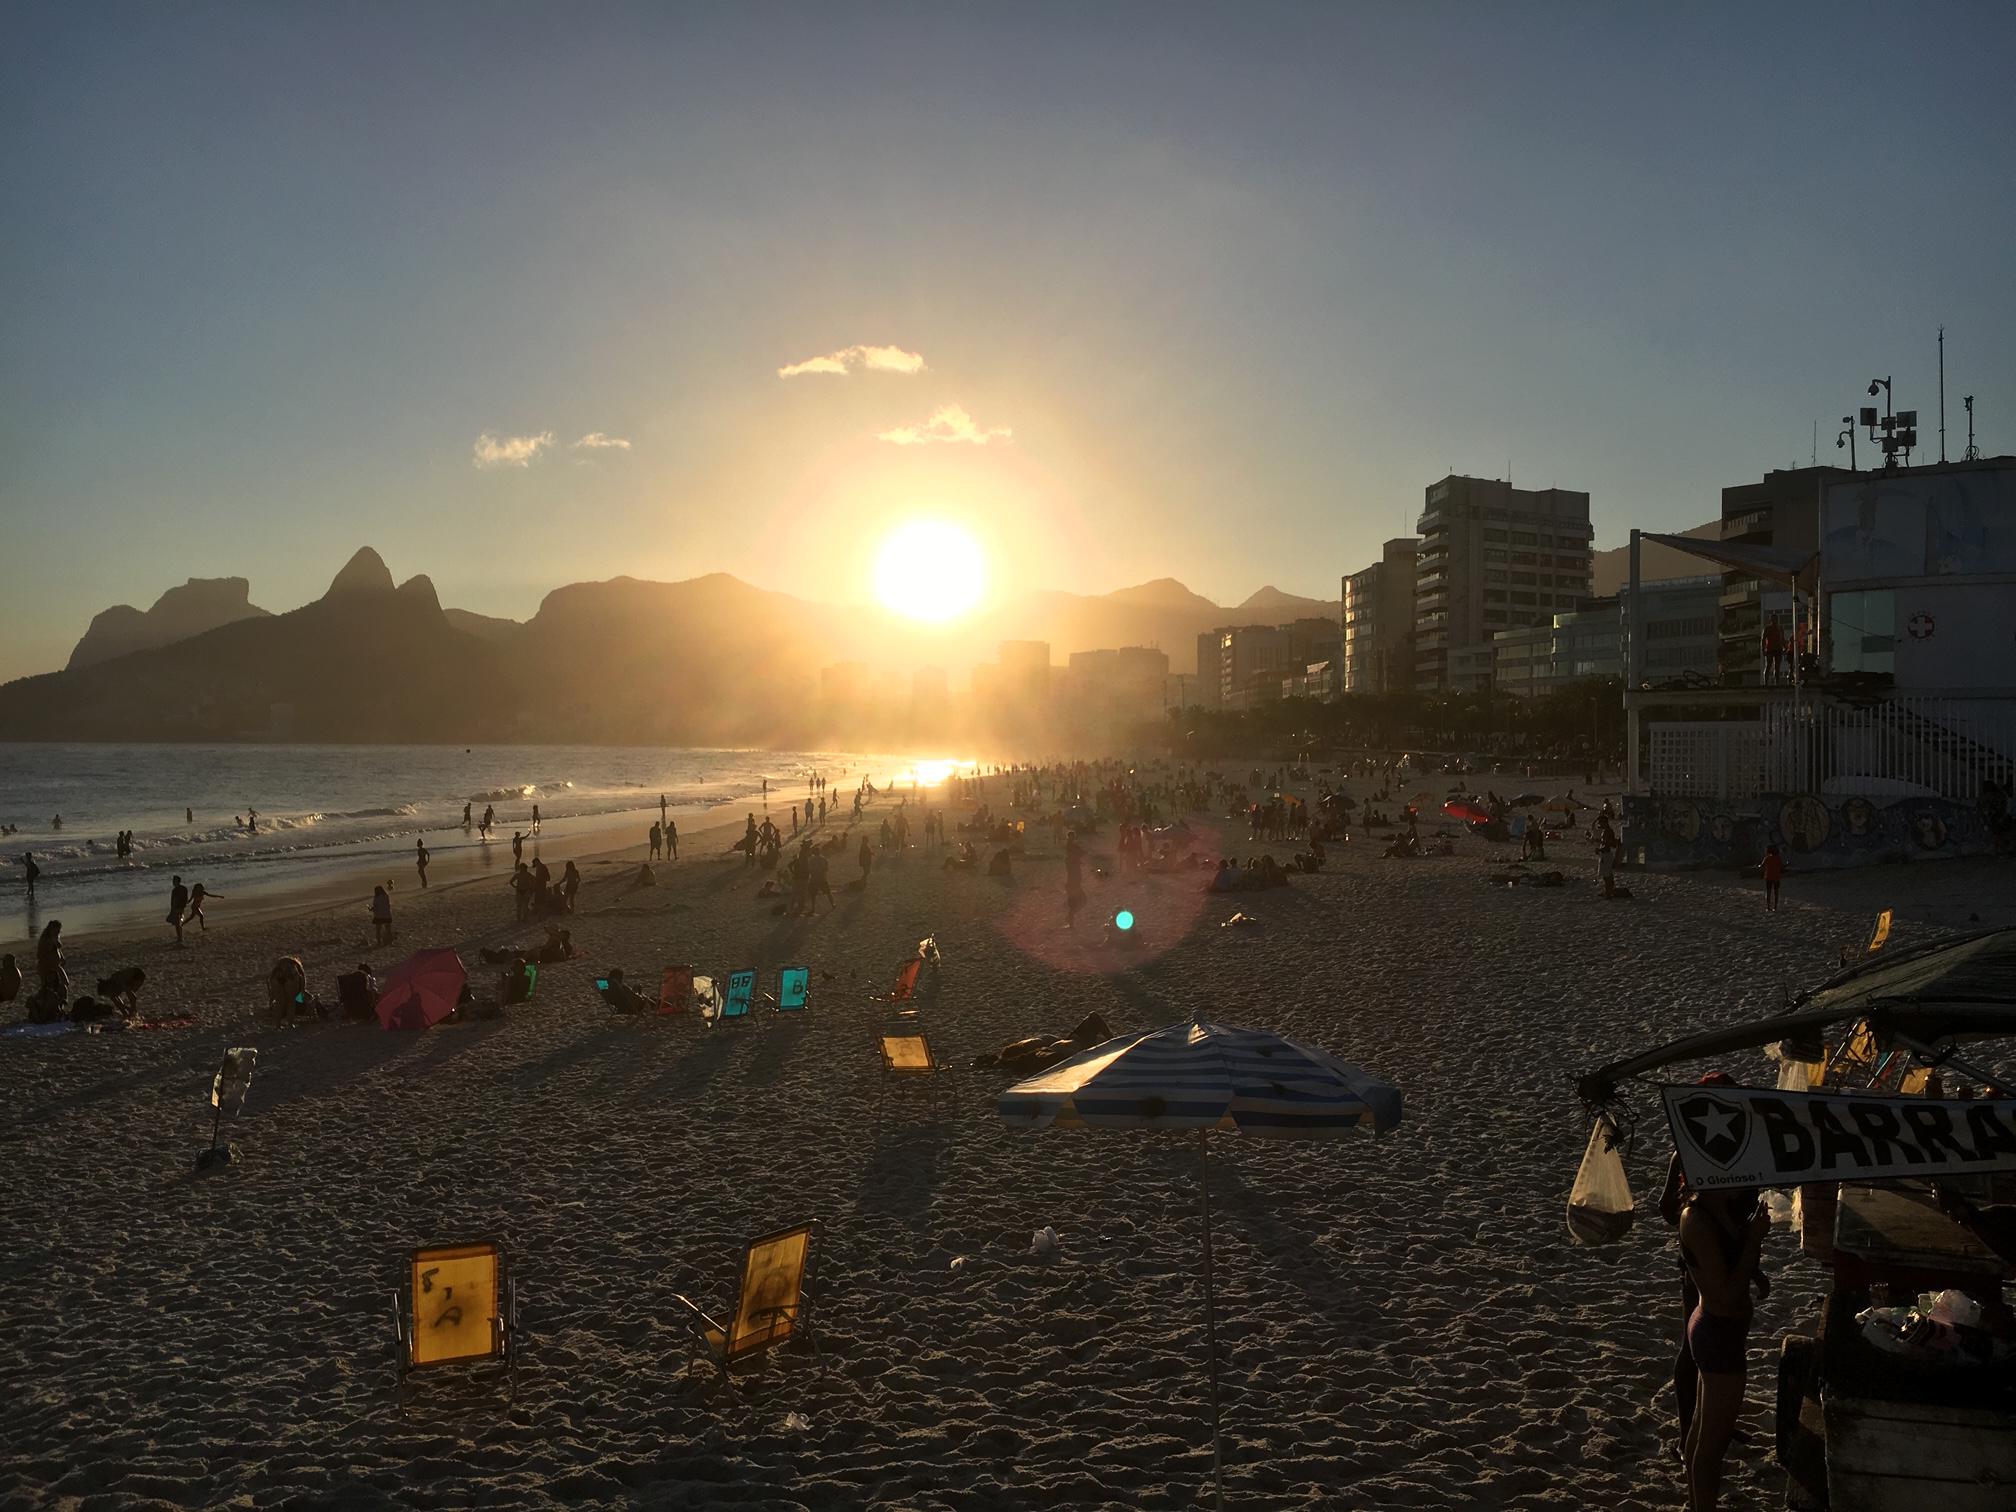 "Brazil_copacabana_008"""""